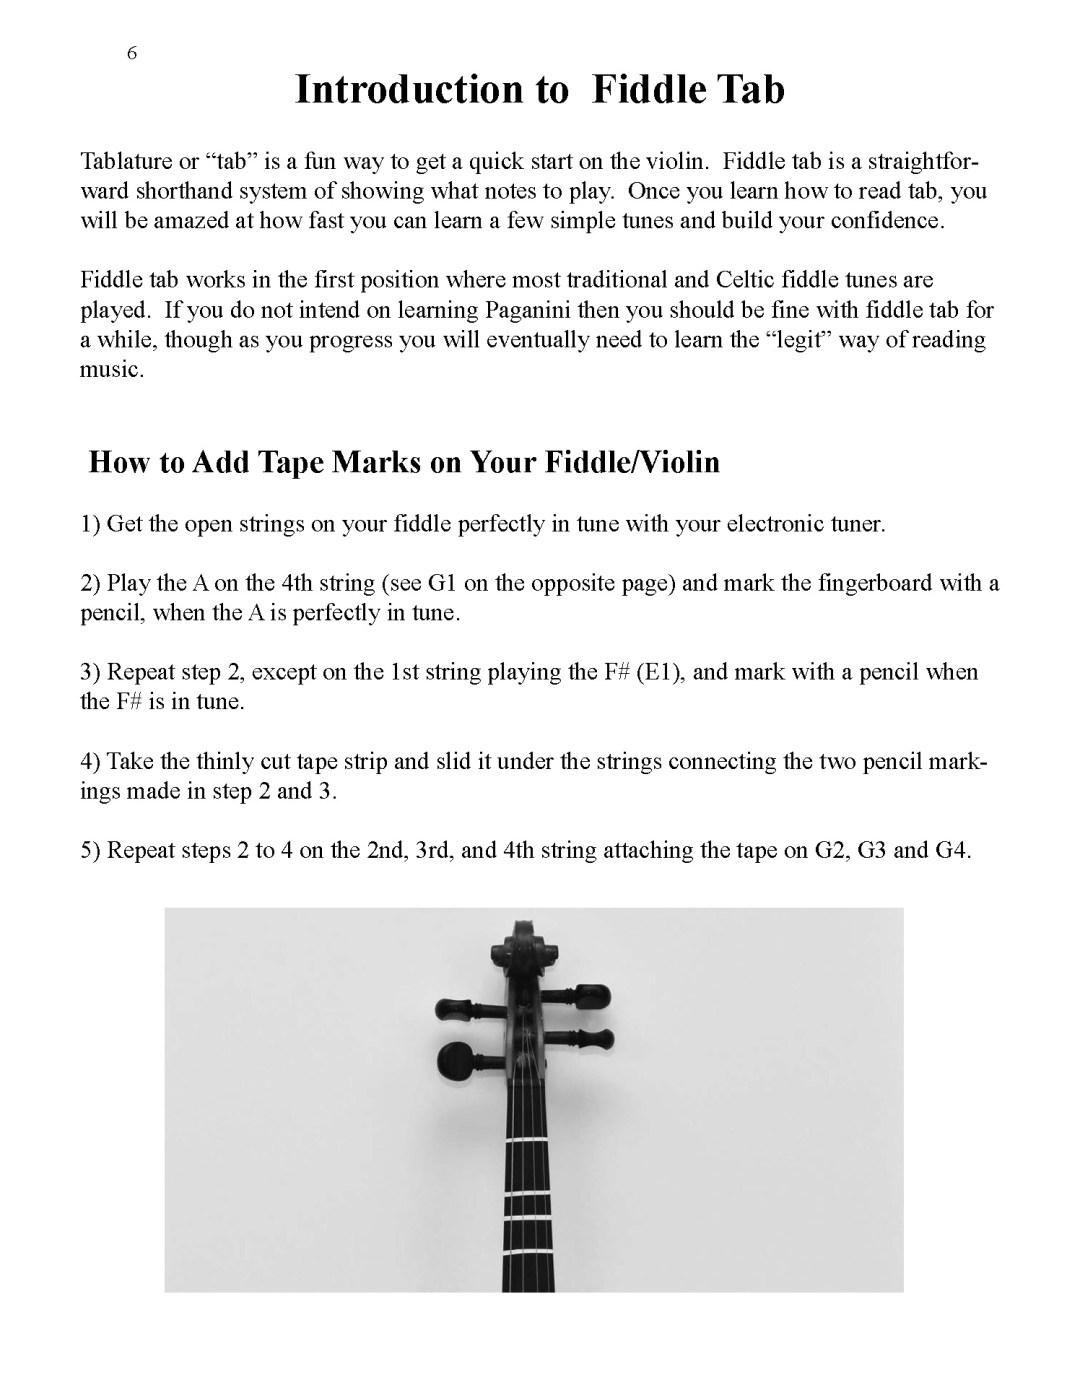 fiddle-tab-tape-marks